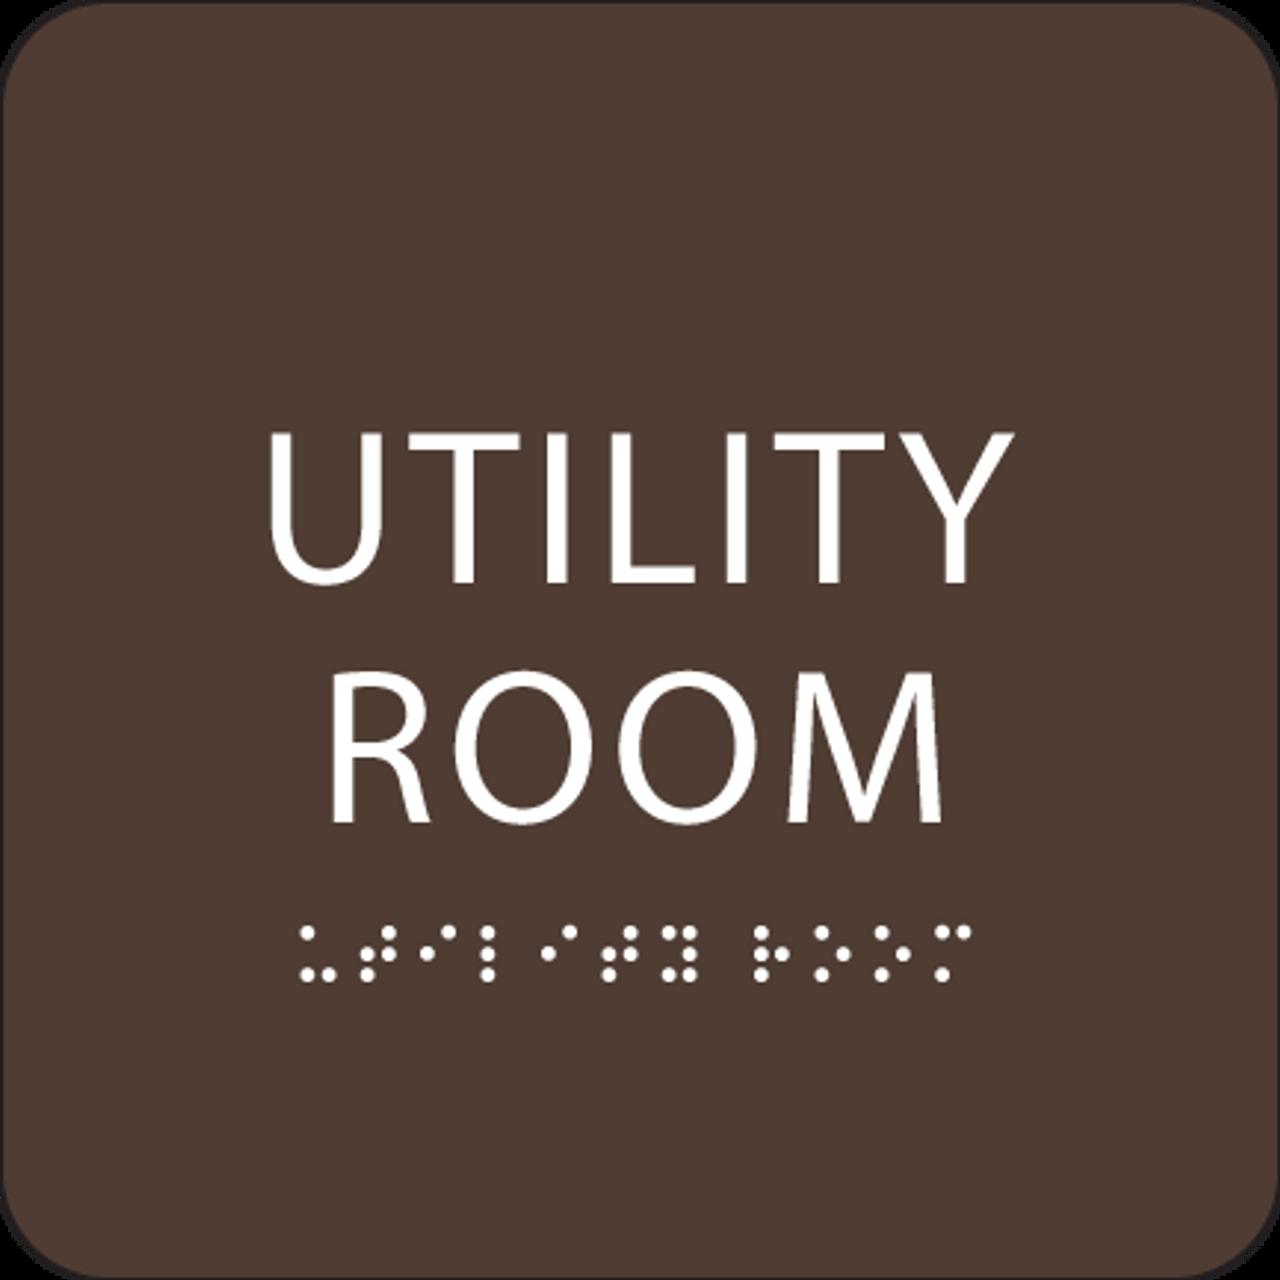 Dark Brown Utility Room ADA Sign